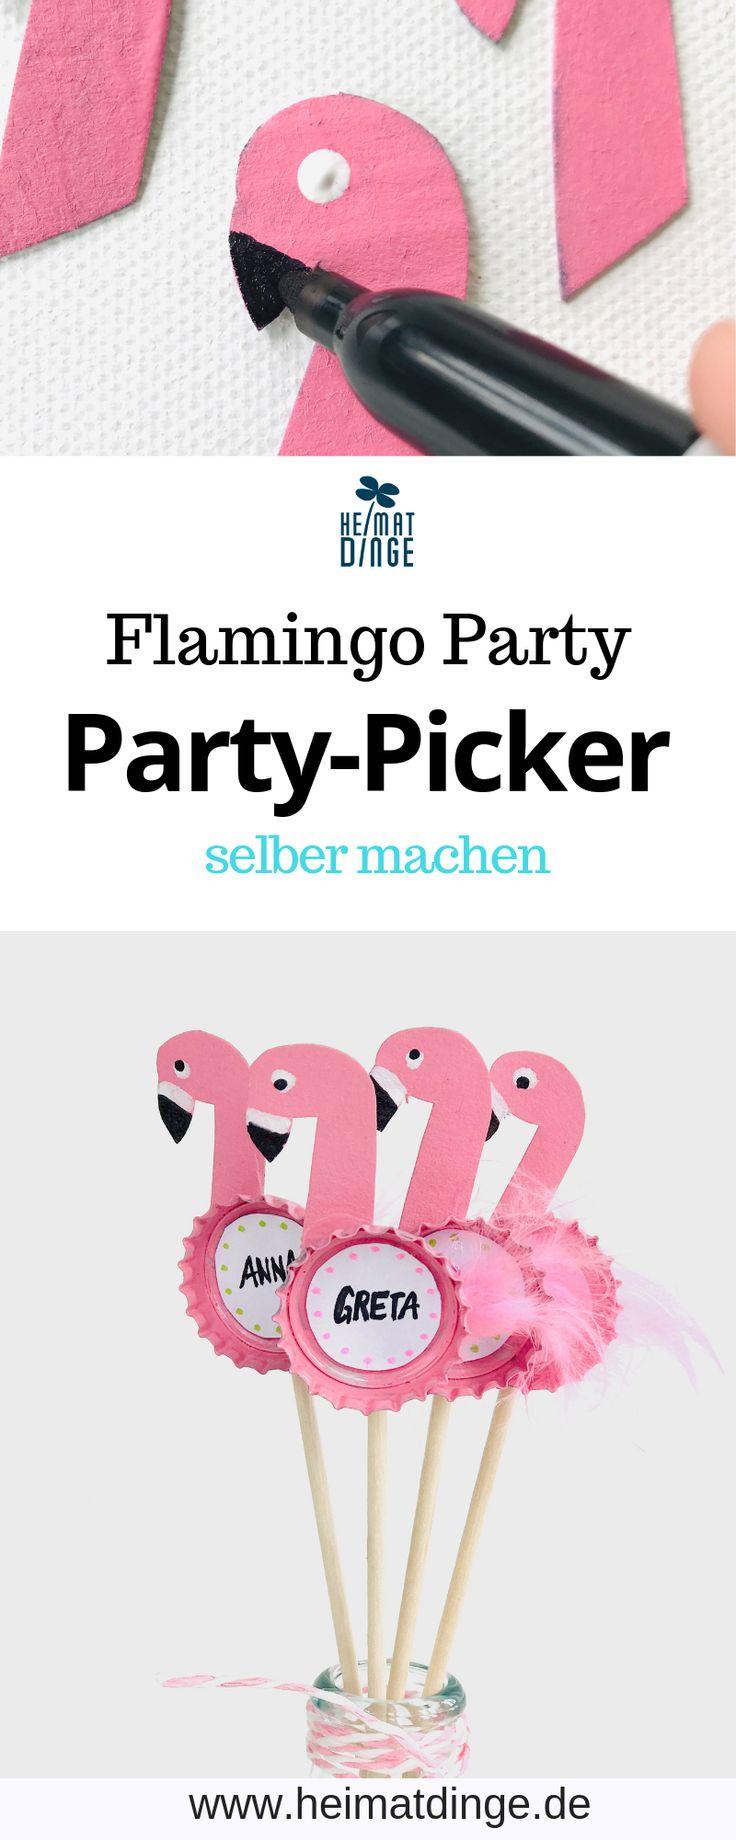 Flamingo basteln – Party Sticks selber machen